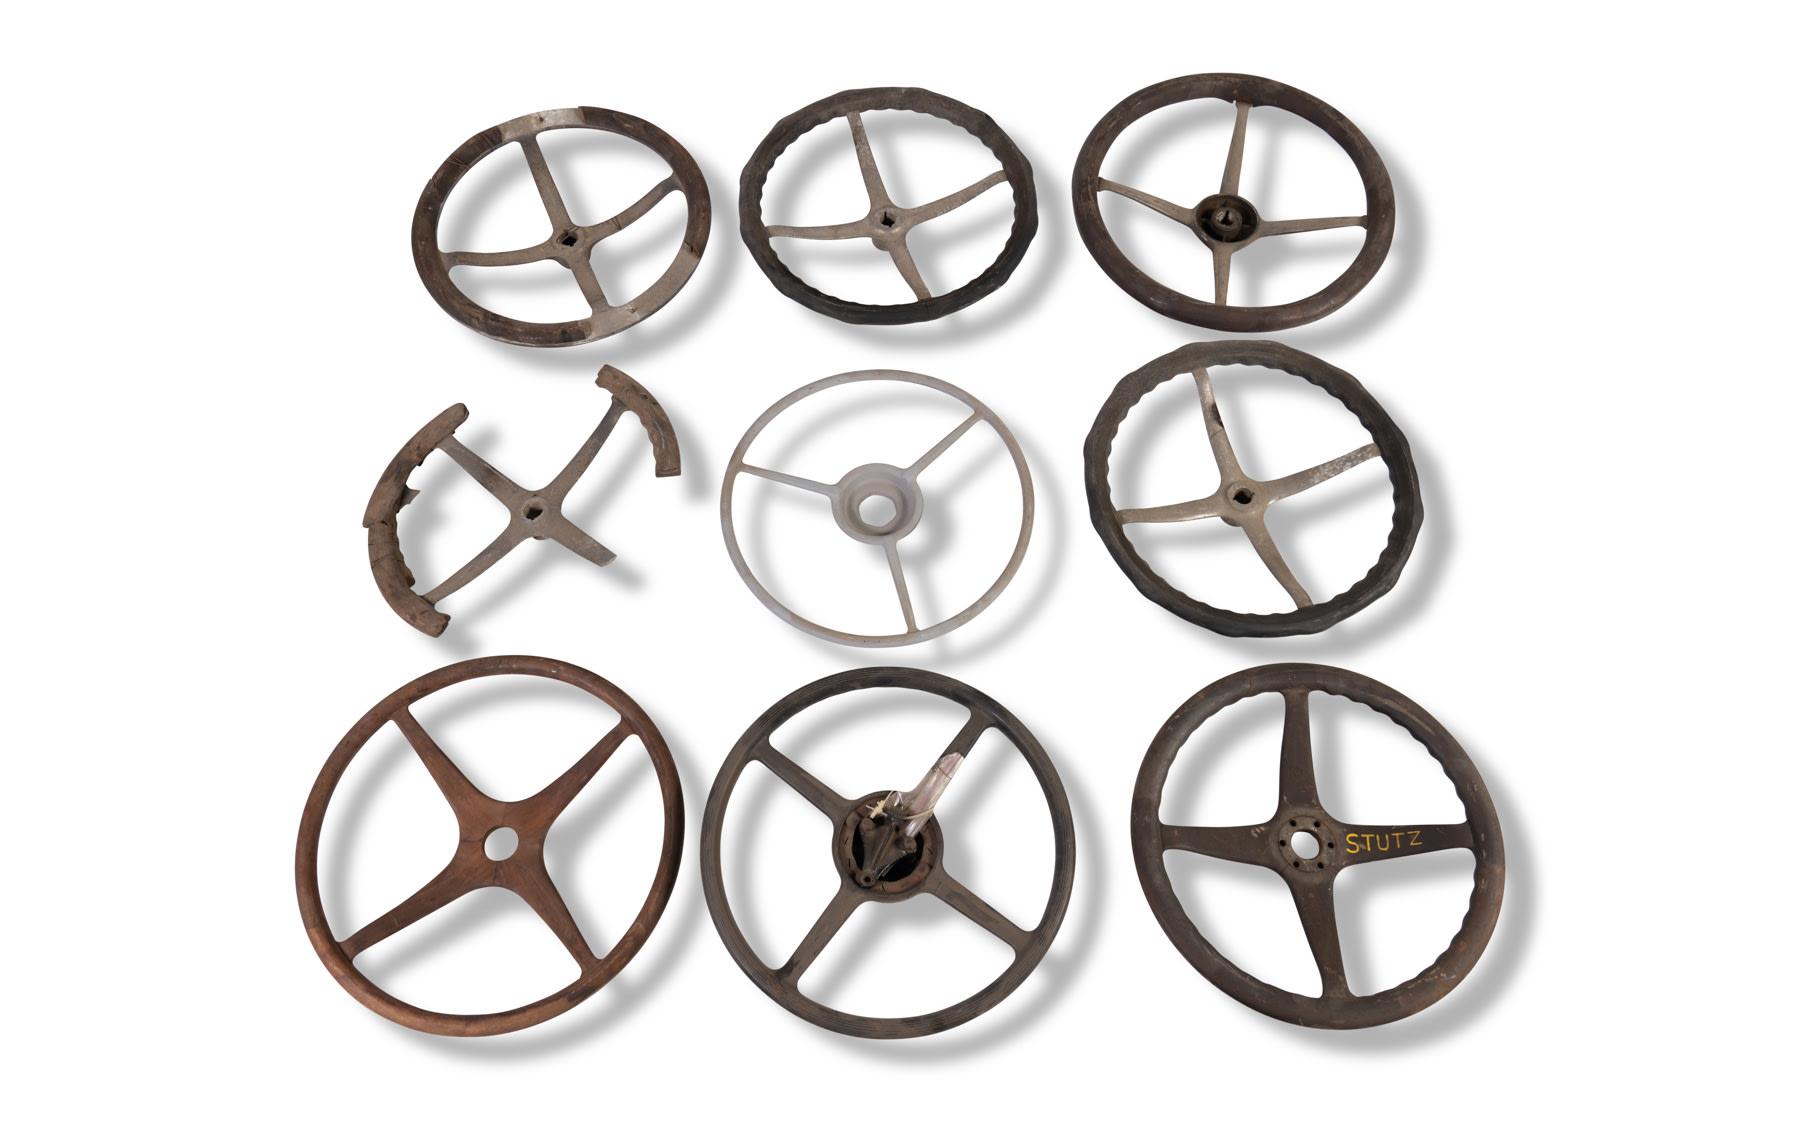 Assorted Automotive Steering Wheels